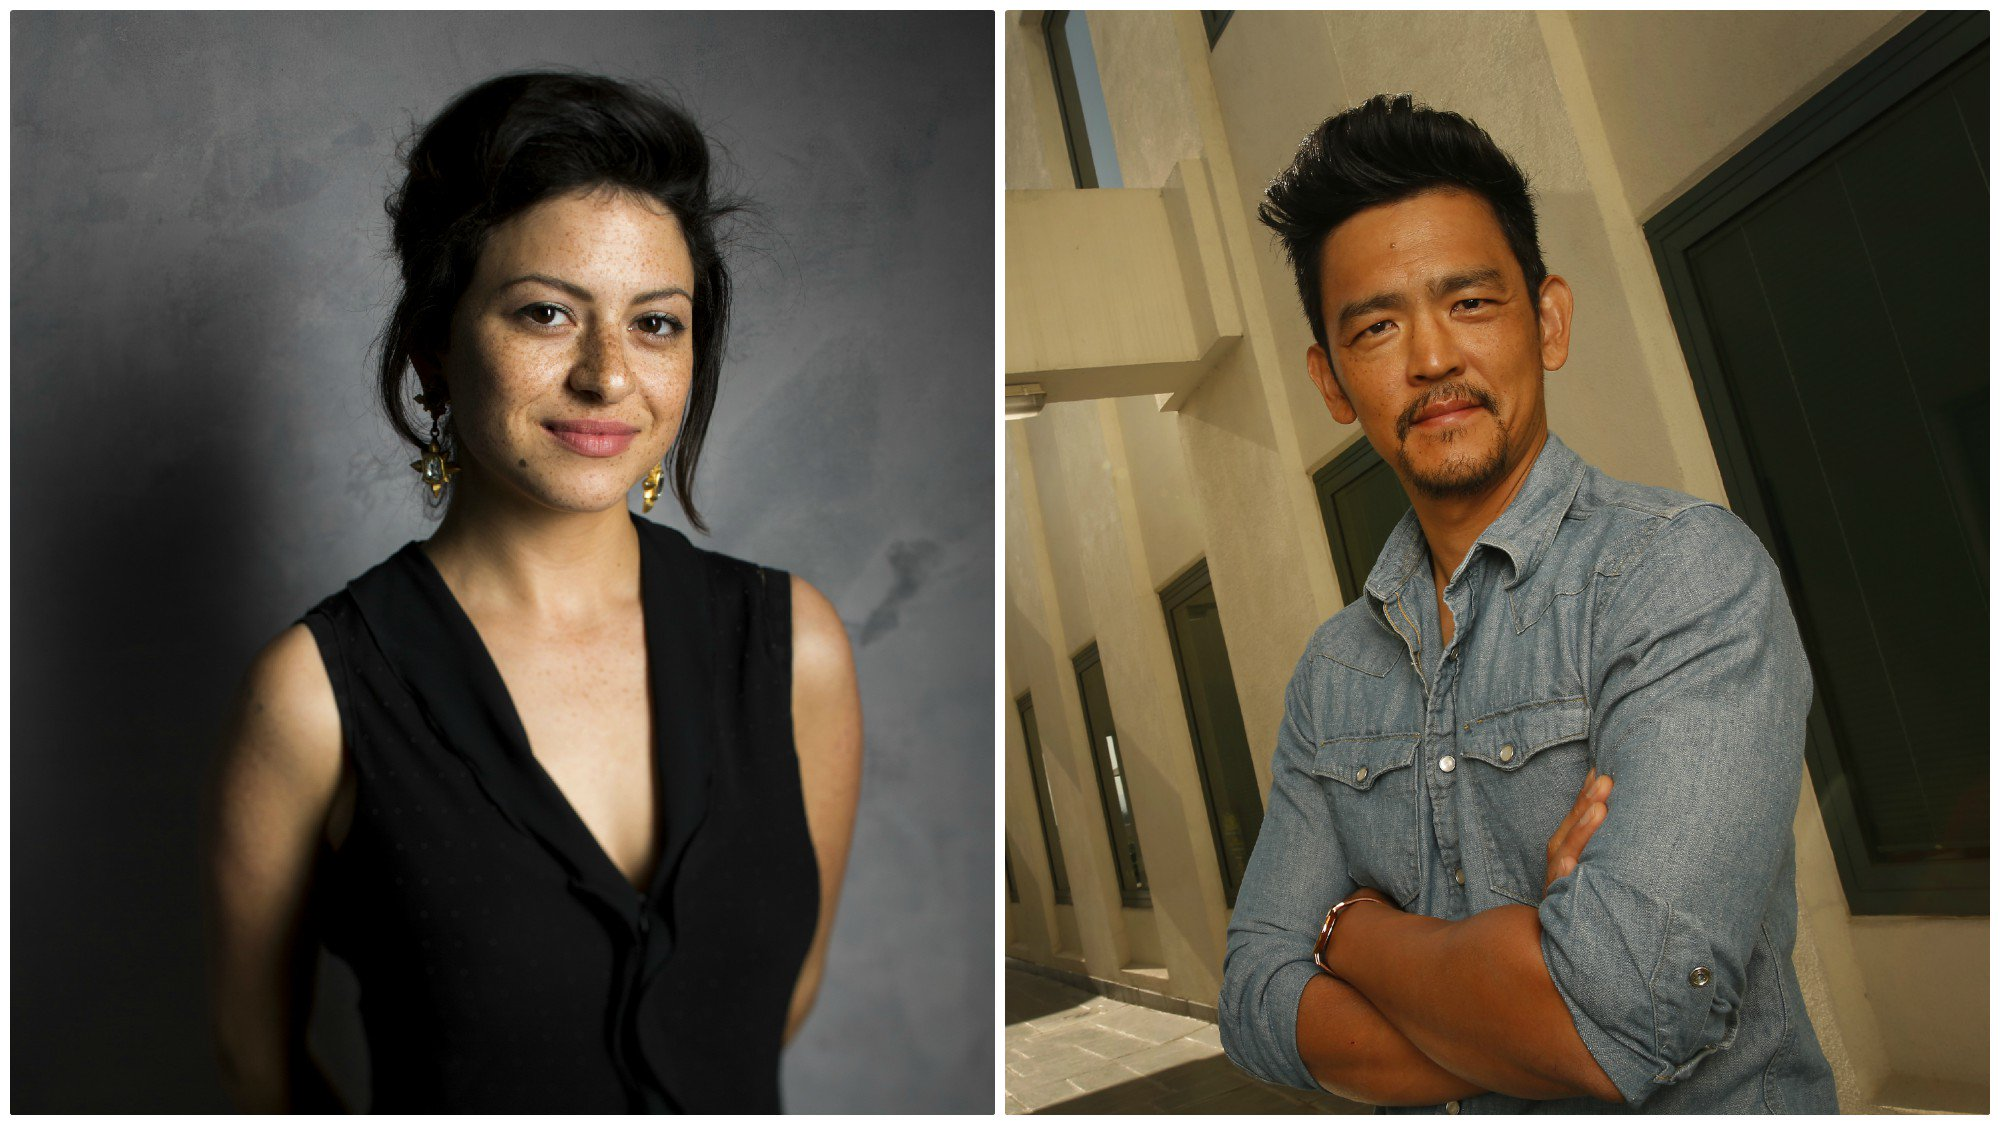 Alia Shawkat and John Cho to host Spirit Awards nominees brunch https://t.co/ccaEk3mOQ9 https://t.co/nCm0R0xAtC